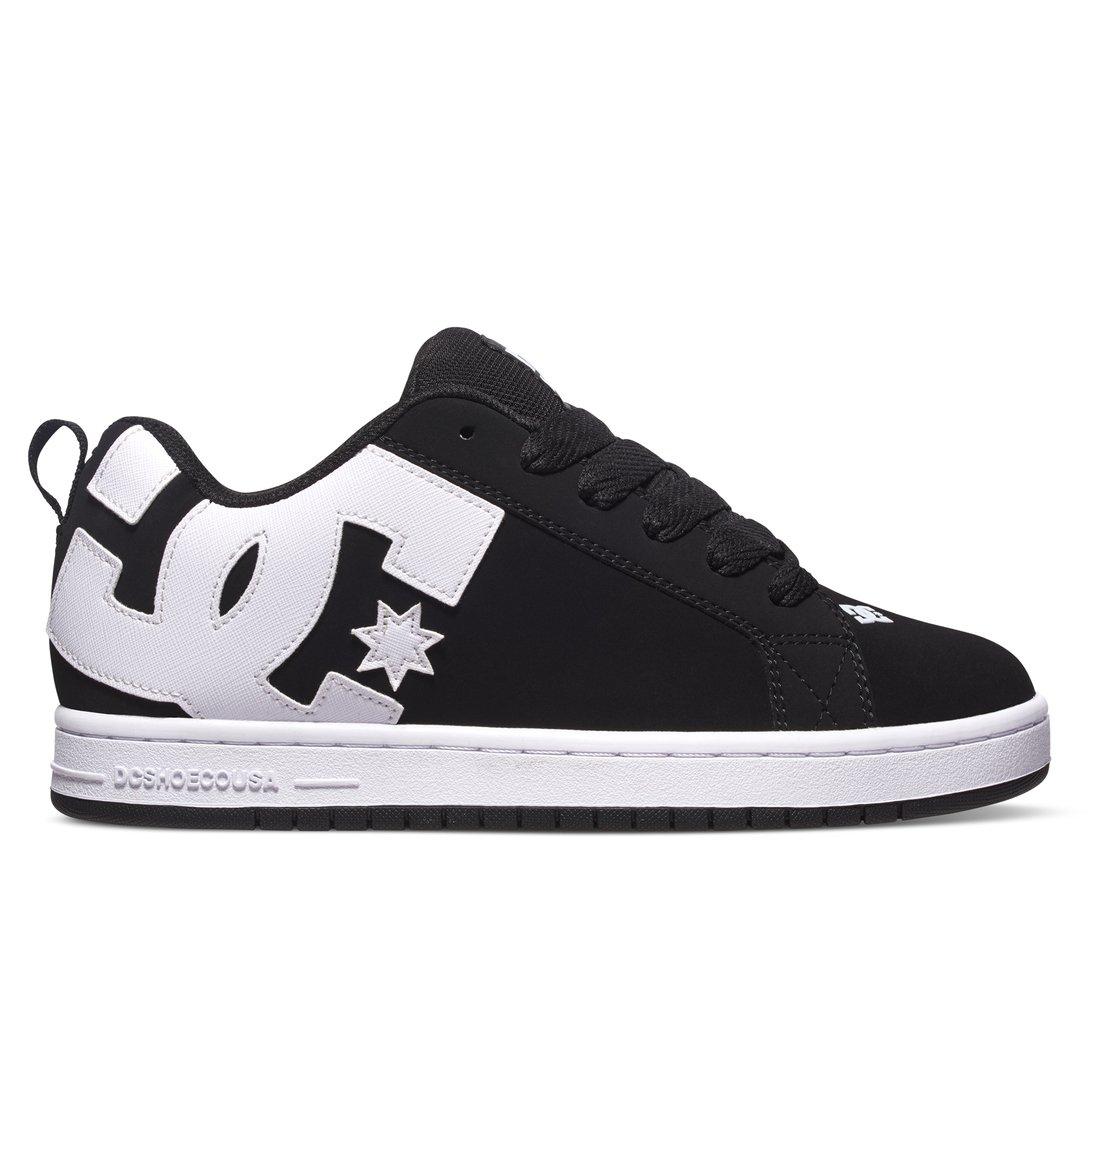 reputable site a33ca 1990f Court Graffik Shoes